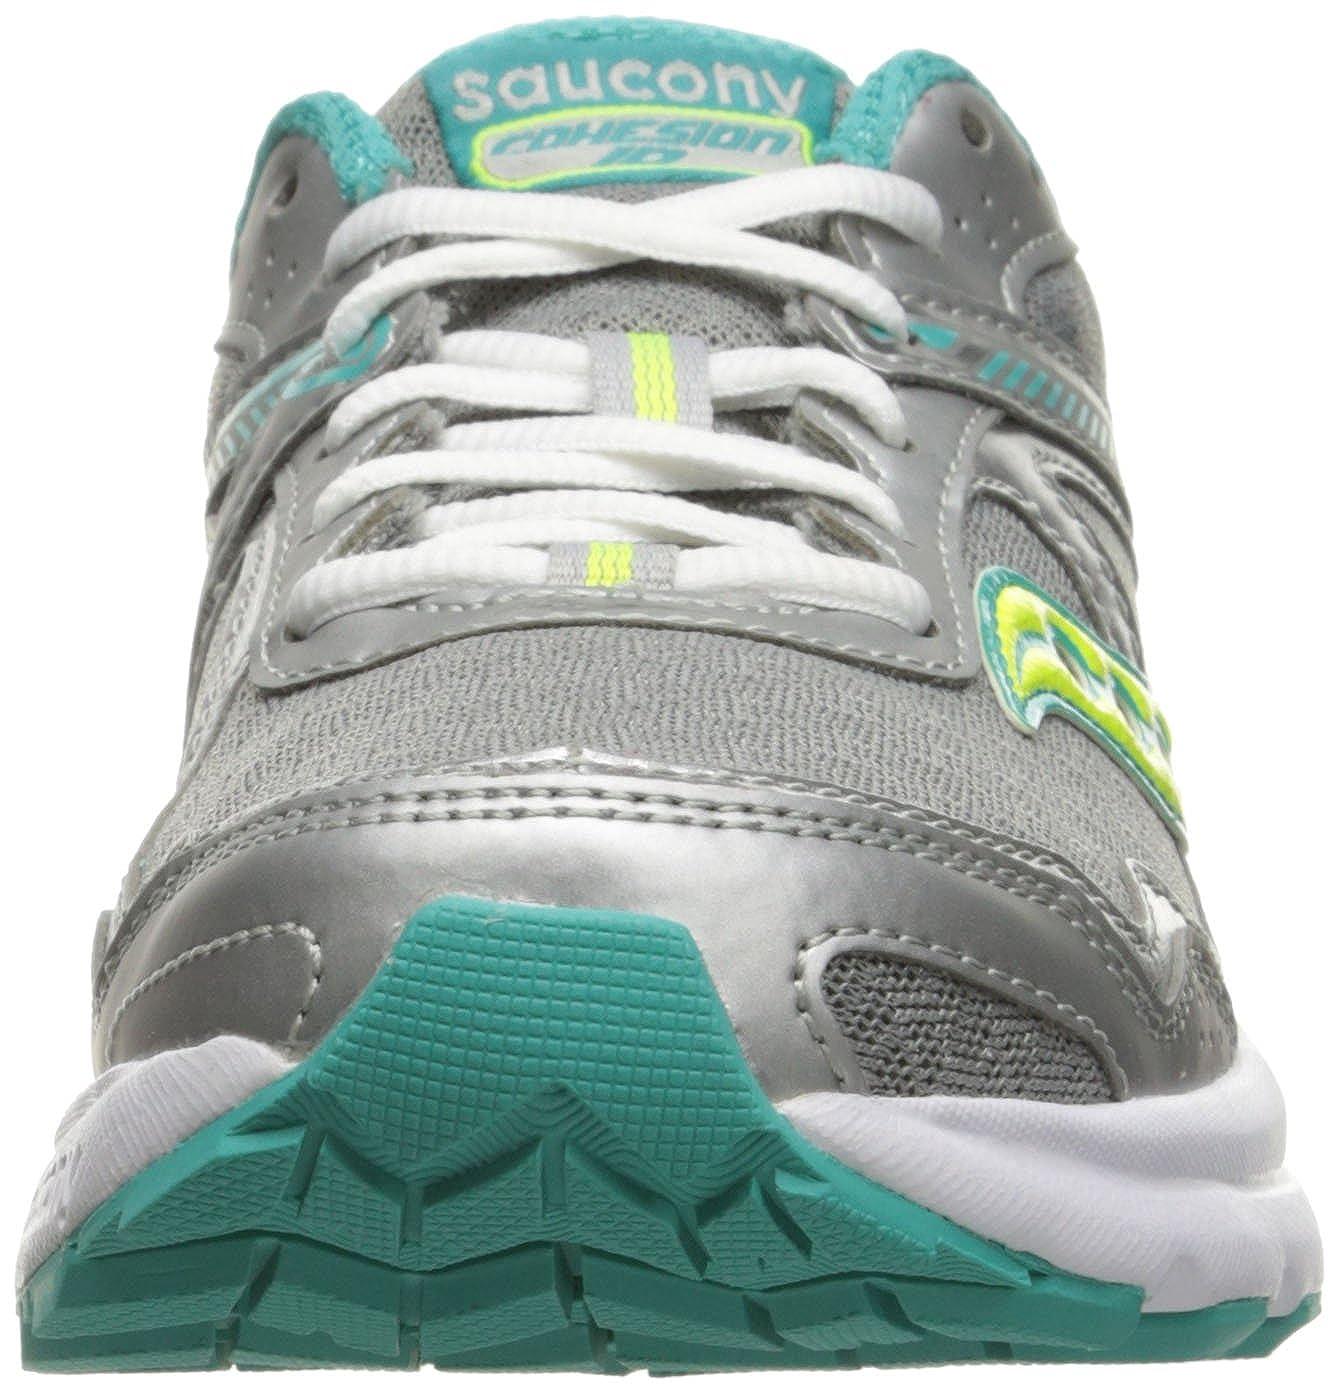 Saucony Damen Cohesion 9 W Sneaker Grau/Teal/Ctn Grau/Teal/Ctn Sneaker 686d71